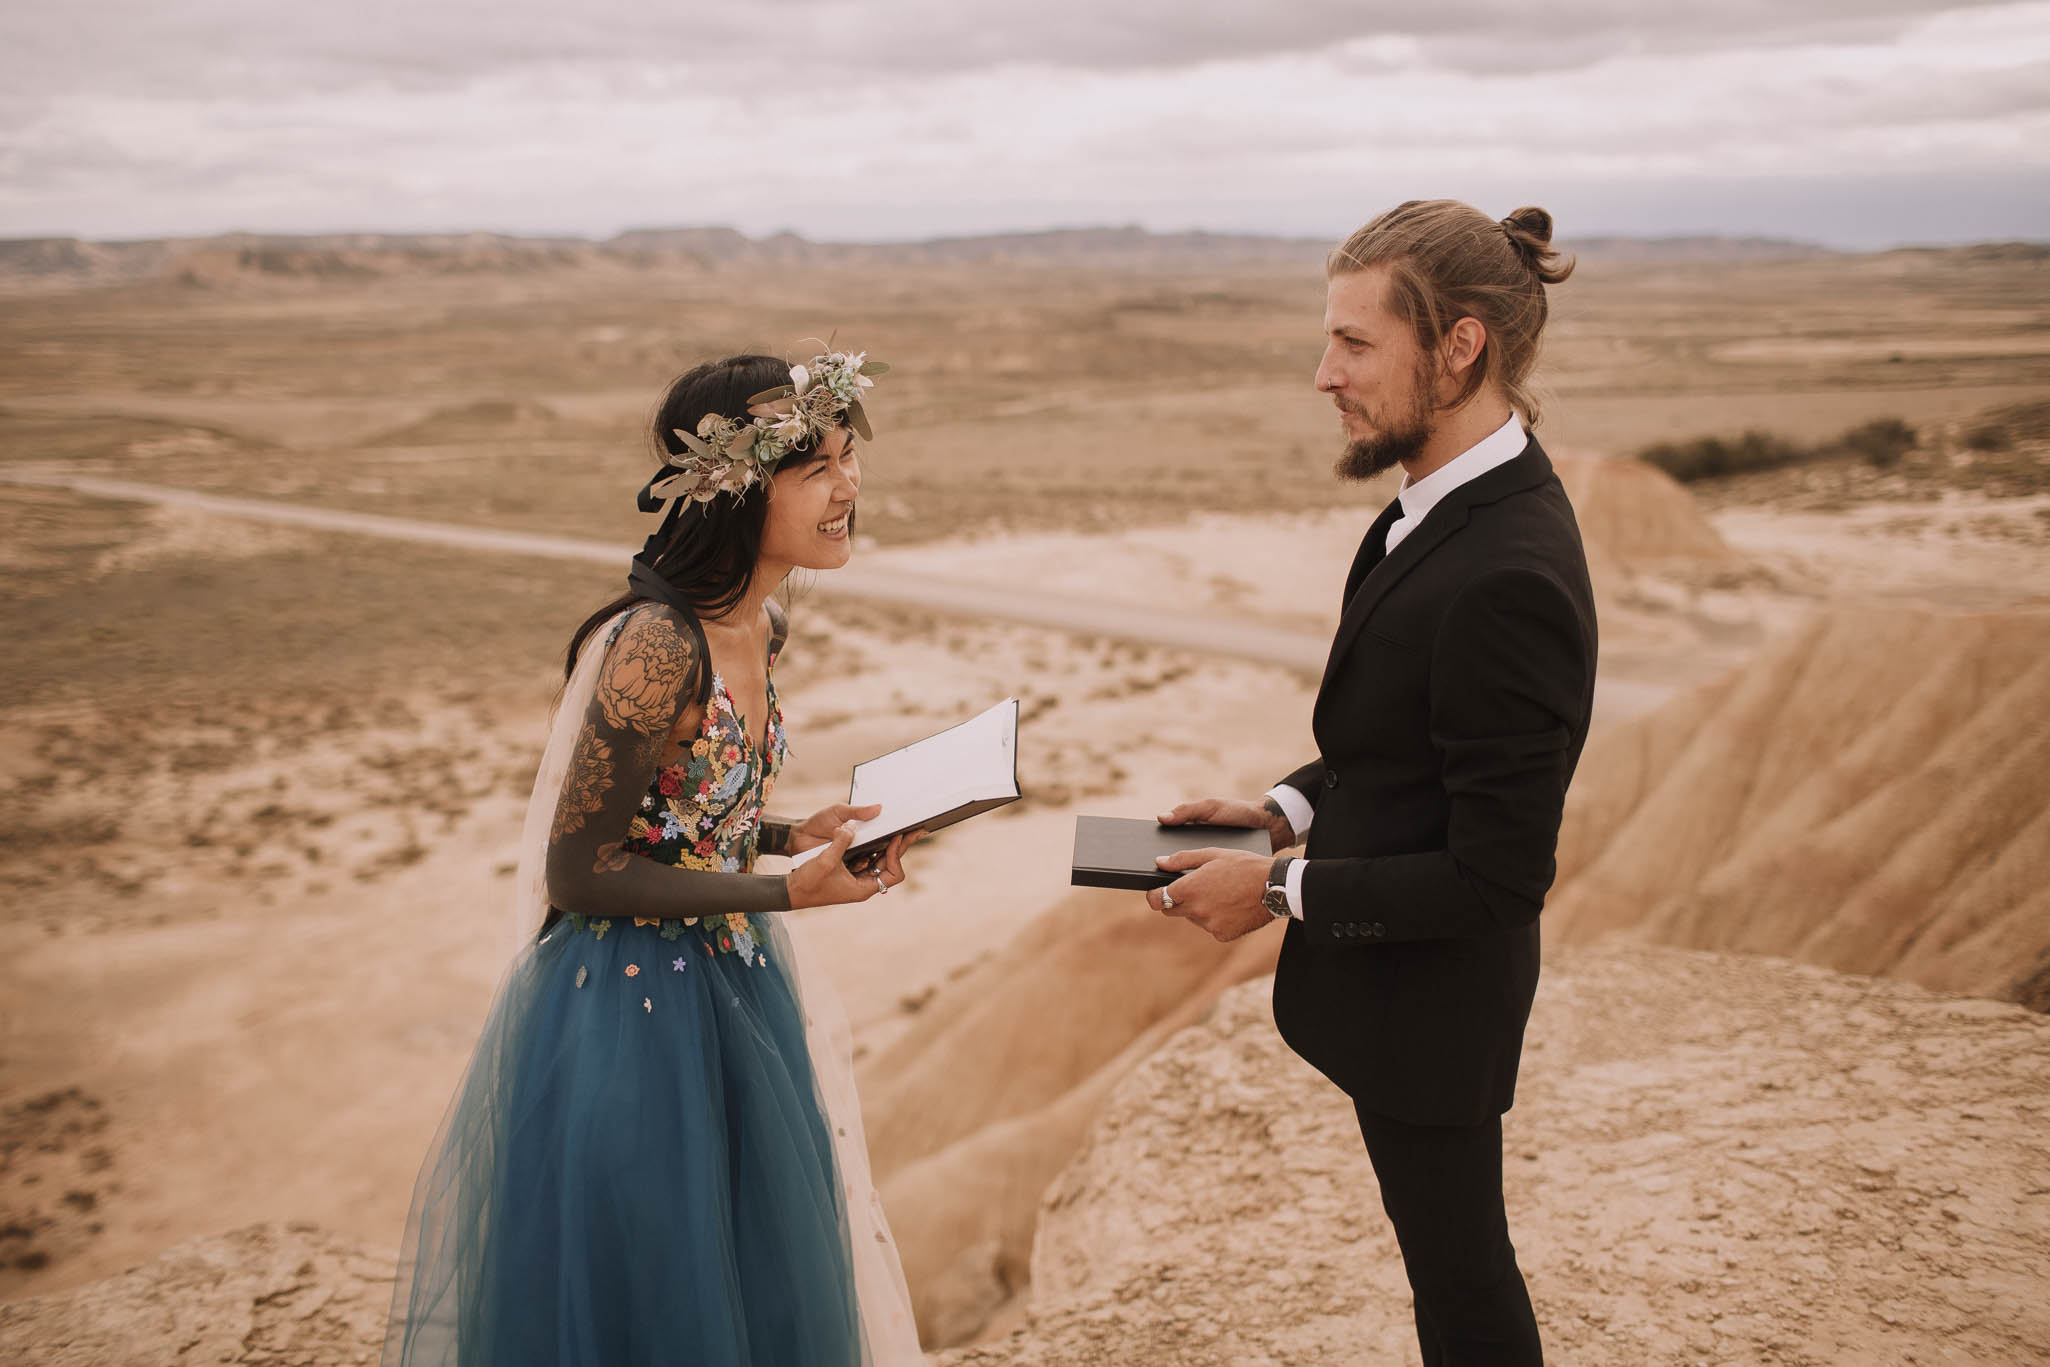 Spain-wedding-photographer-bardenas-reales-jeremy-boyer-photographe-mariage-bordeaux-floral-wedding-dress-robe-92.jpg